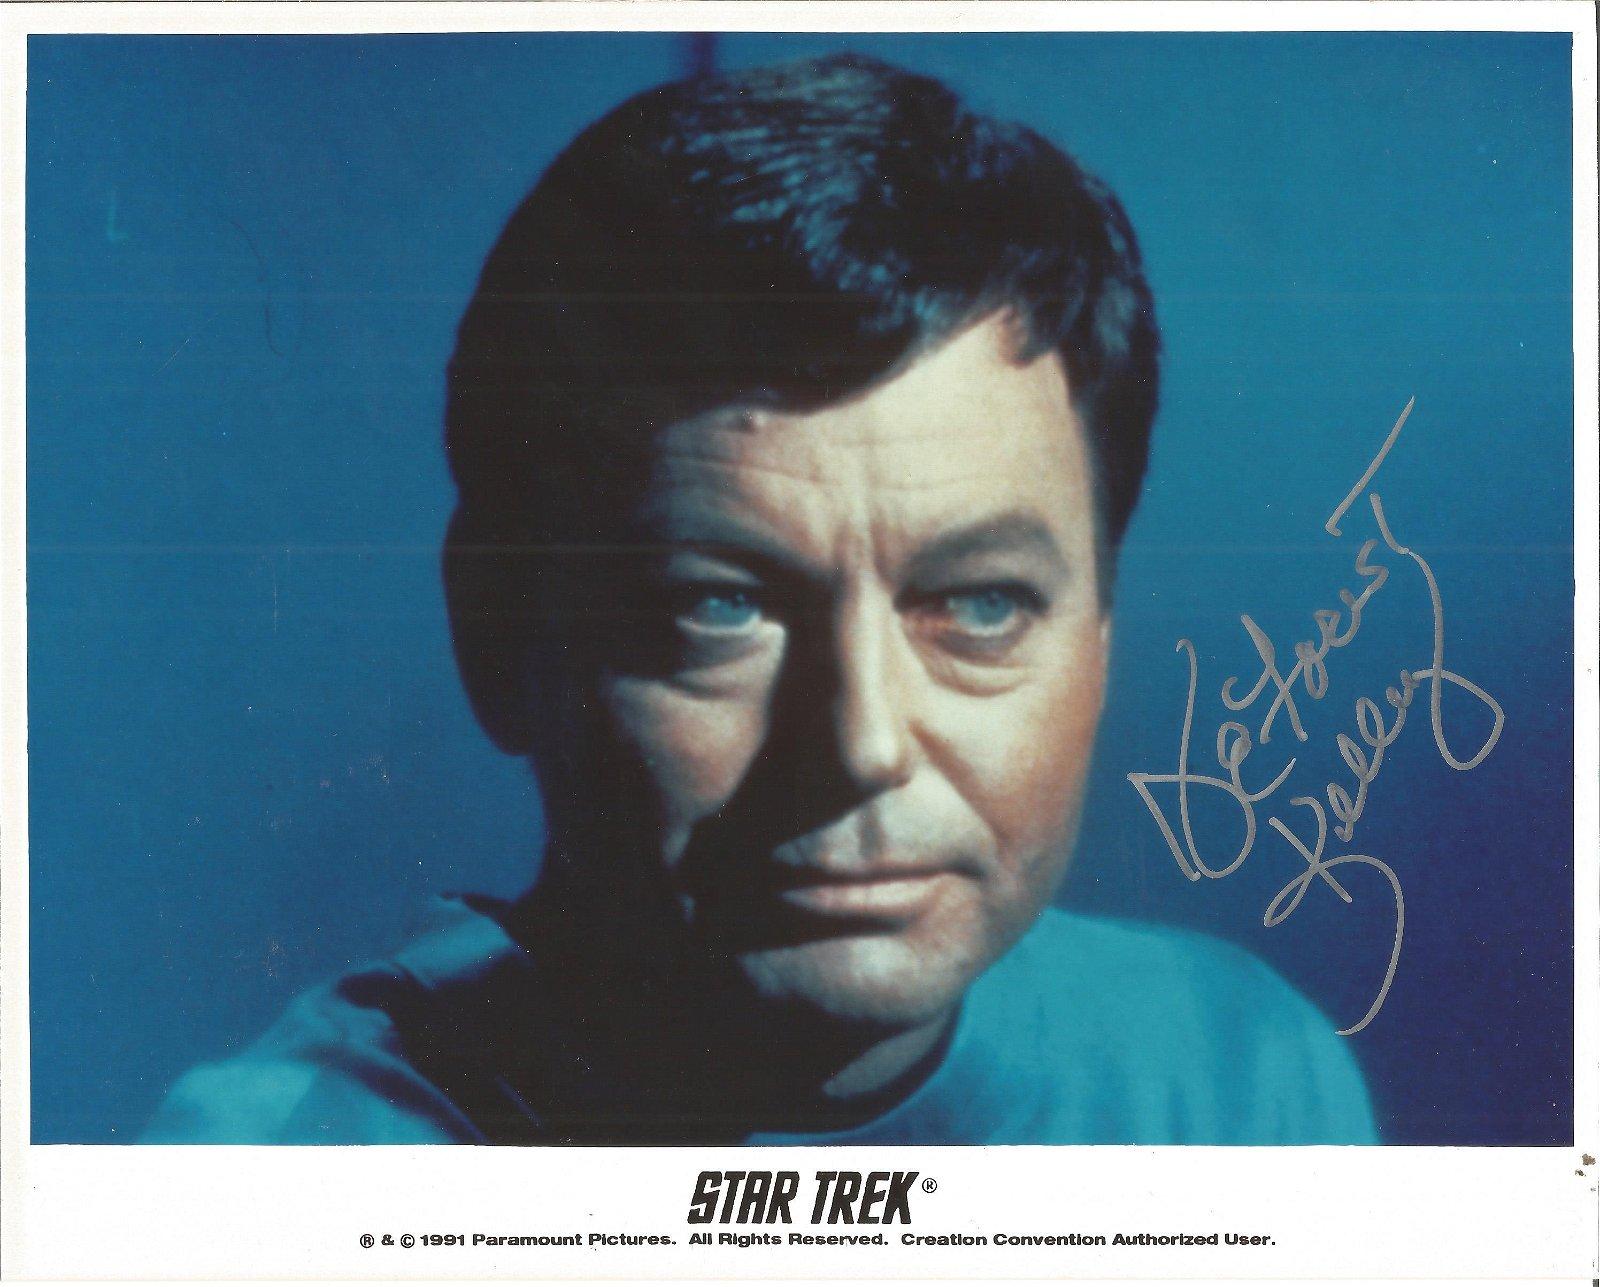 Deforest Kelly 10x8 signed Star Trek colour photo. Good